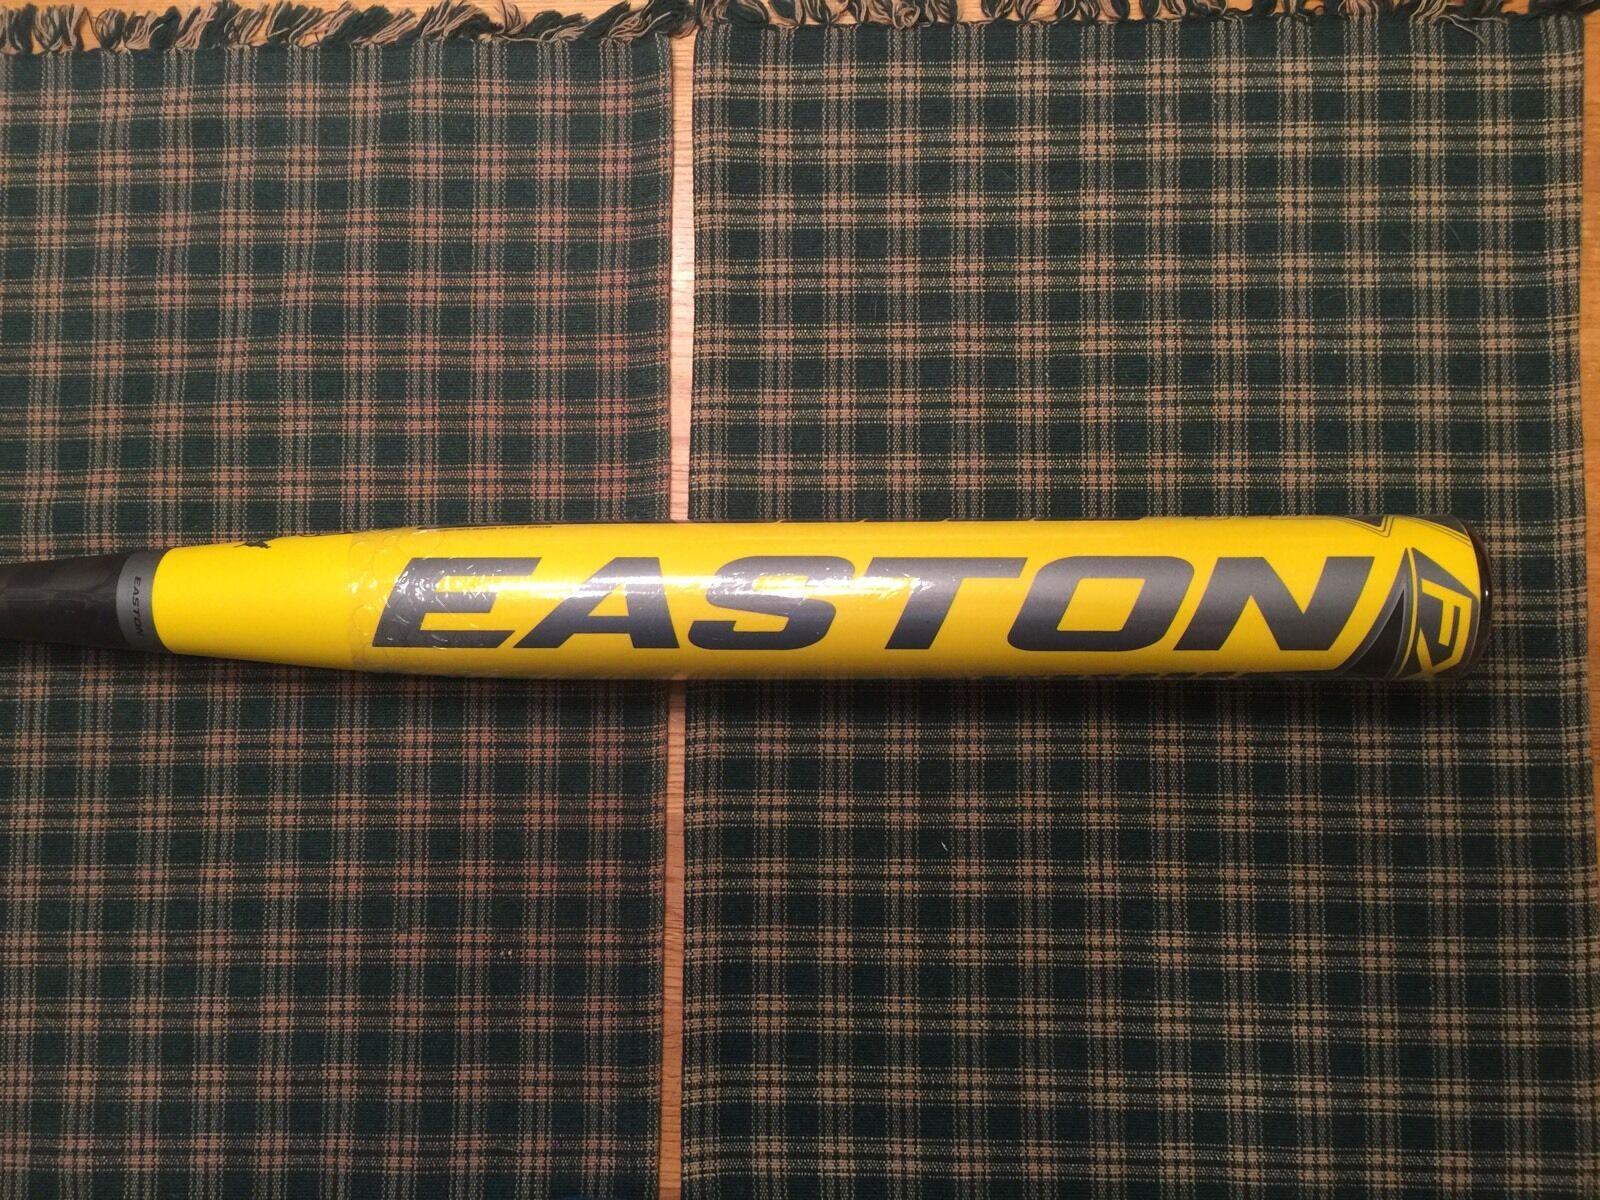 NIW EASTON Power Brigade FX2 FP13X2 33 33 33 24 (-9) Fastpitch Softball Bat ASA 2004 489df7